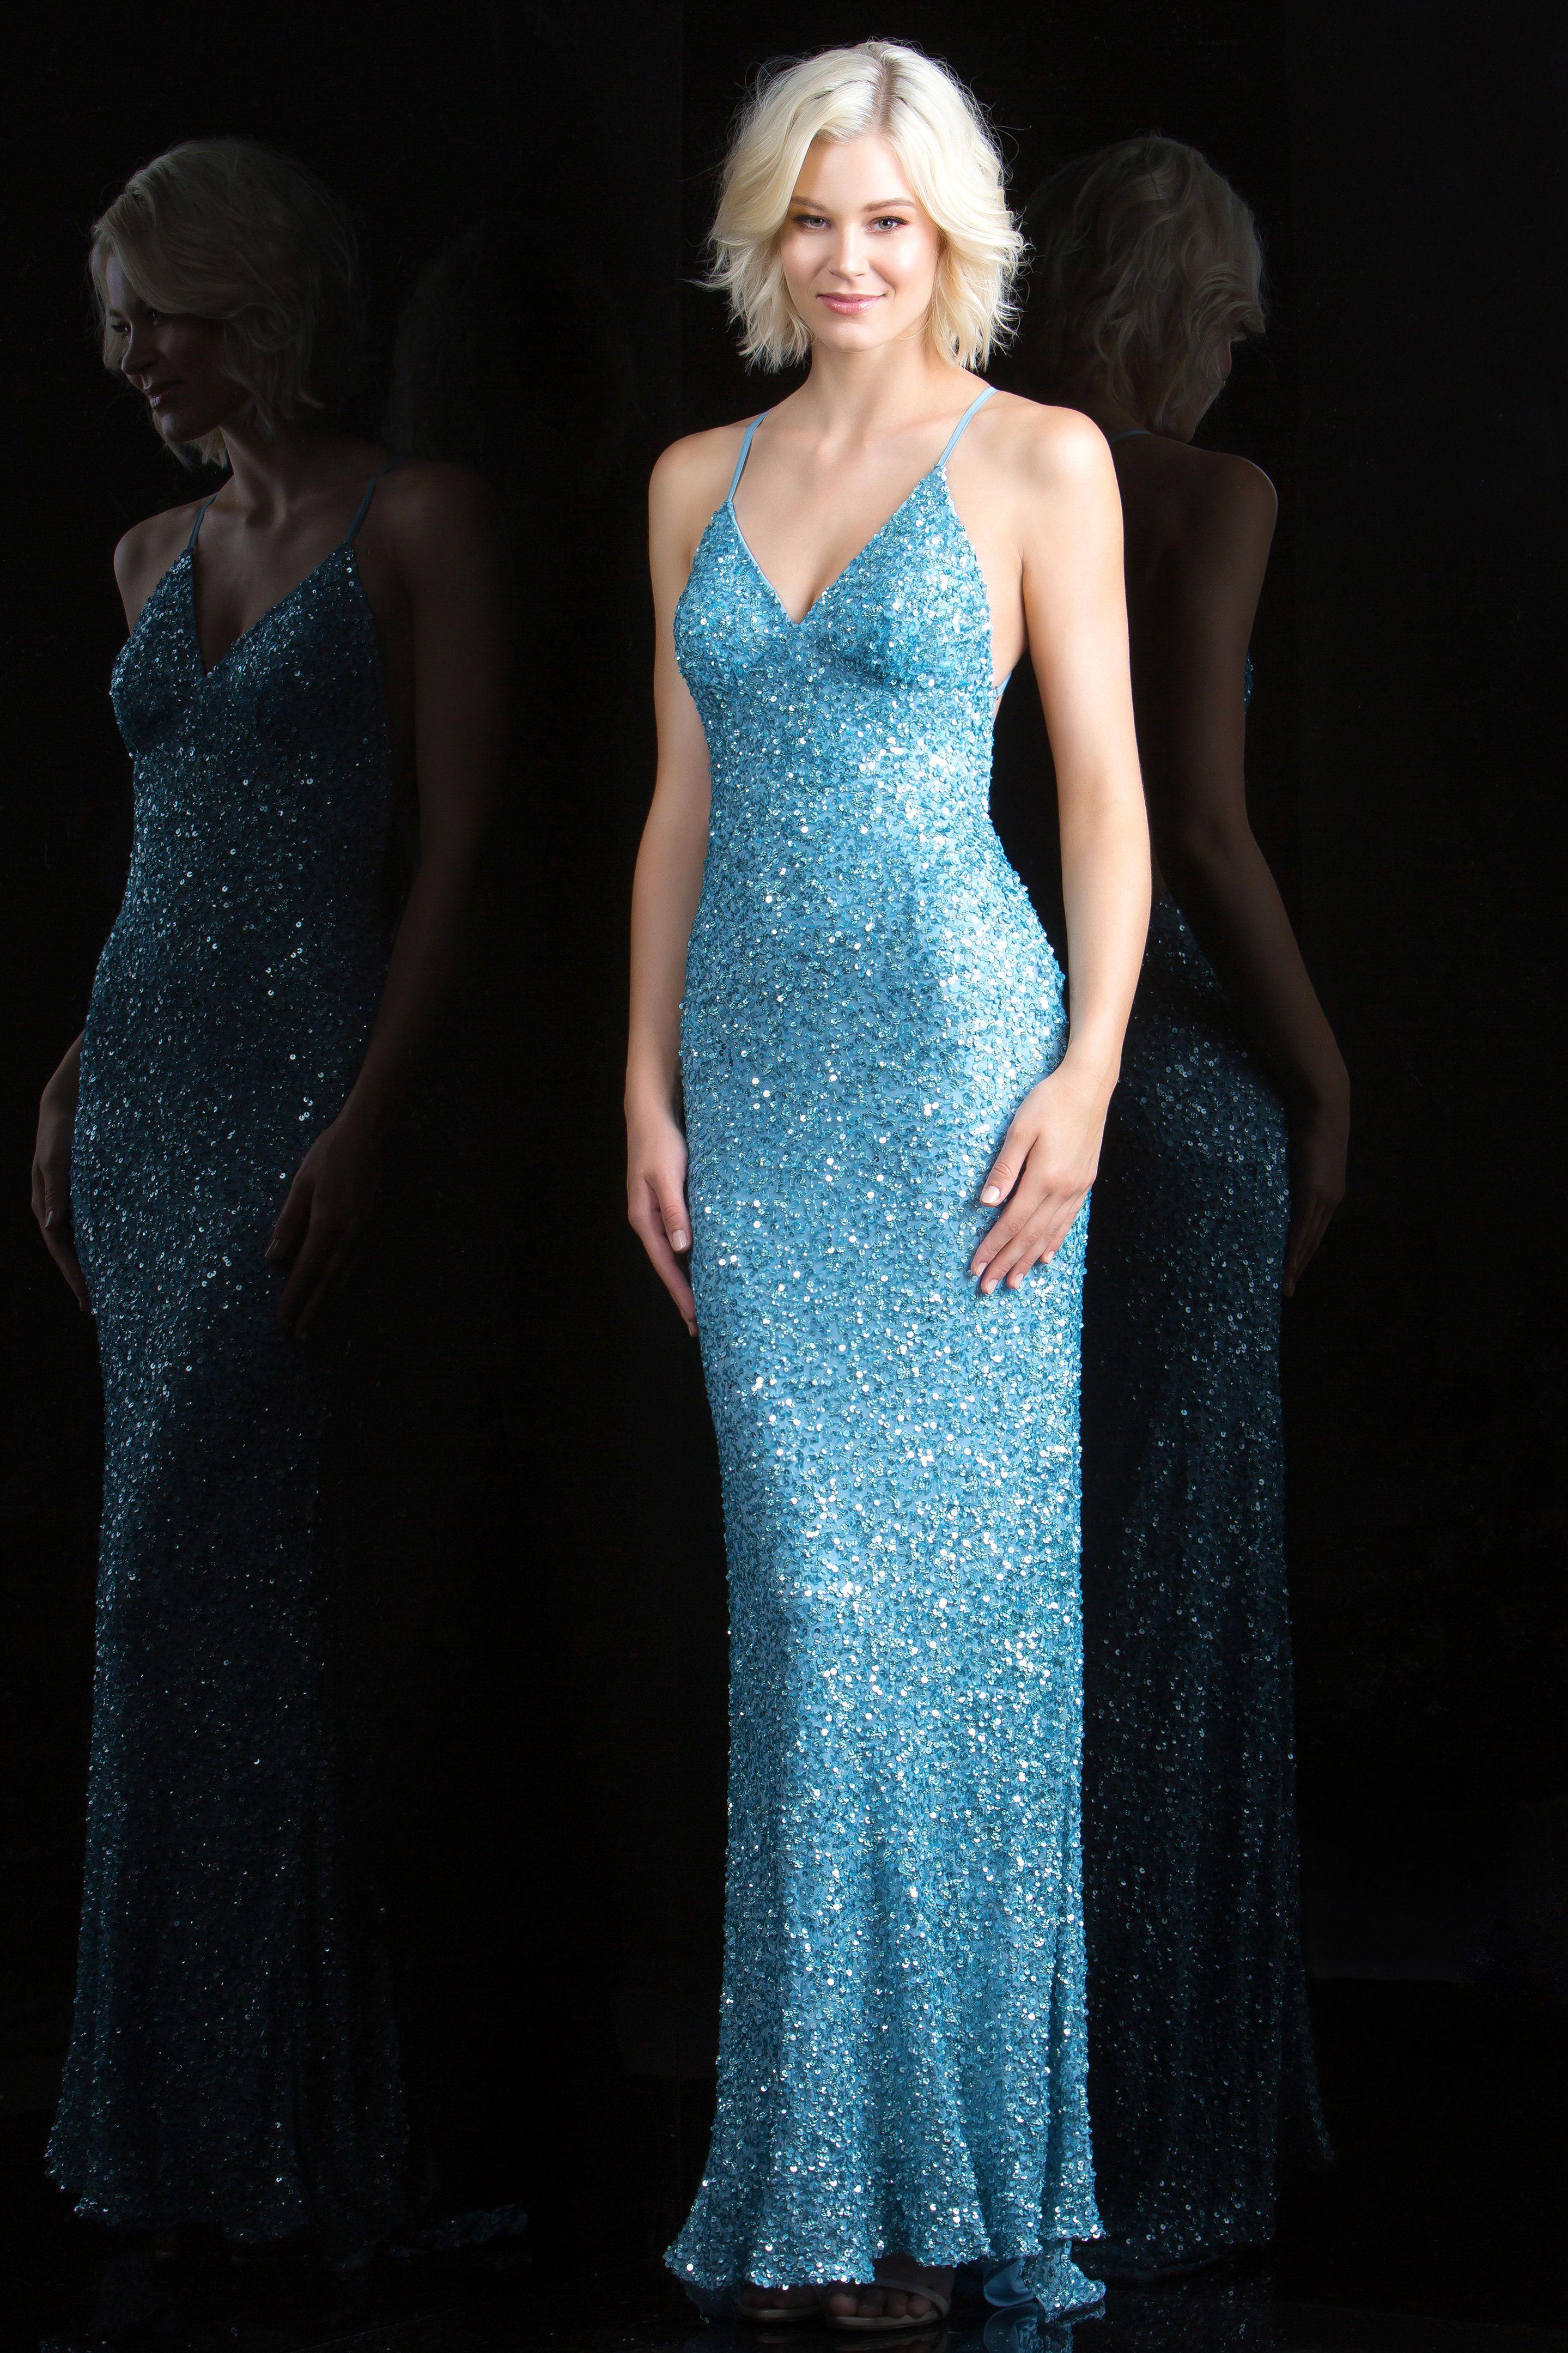 36cdcab9e51 Available at Blush Bridal   Prom - Concord CA - www.myblushbridal ...